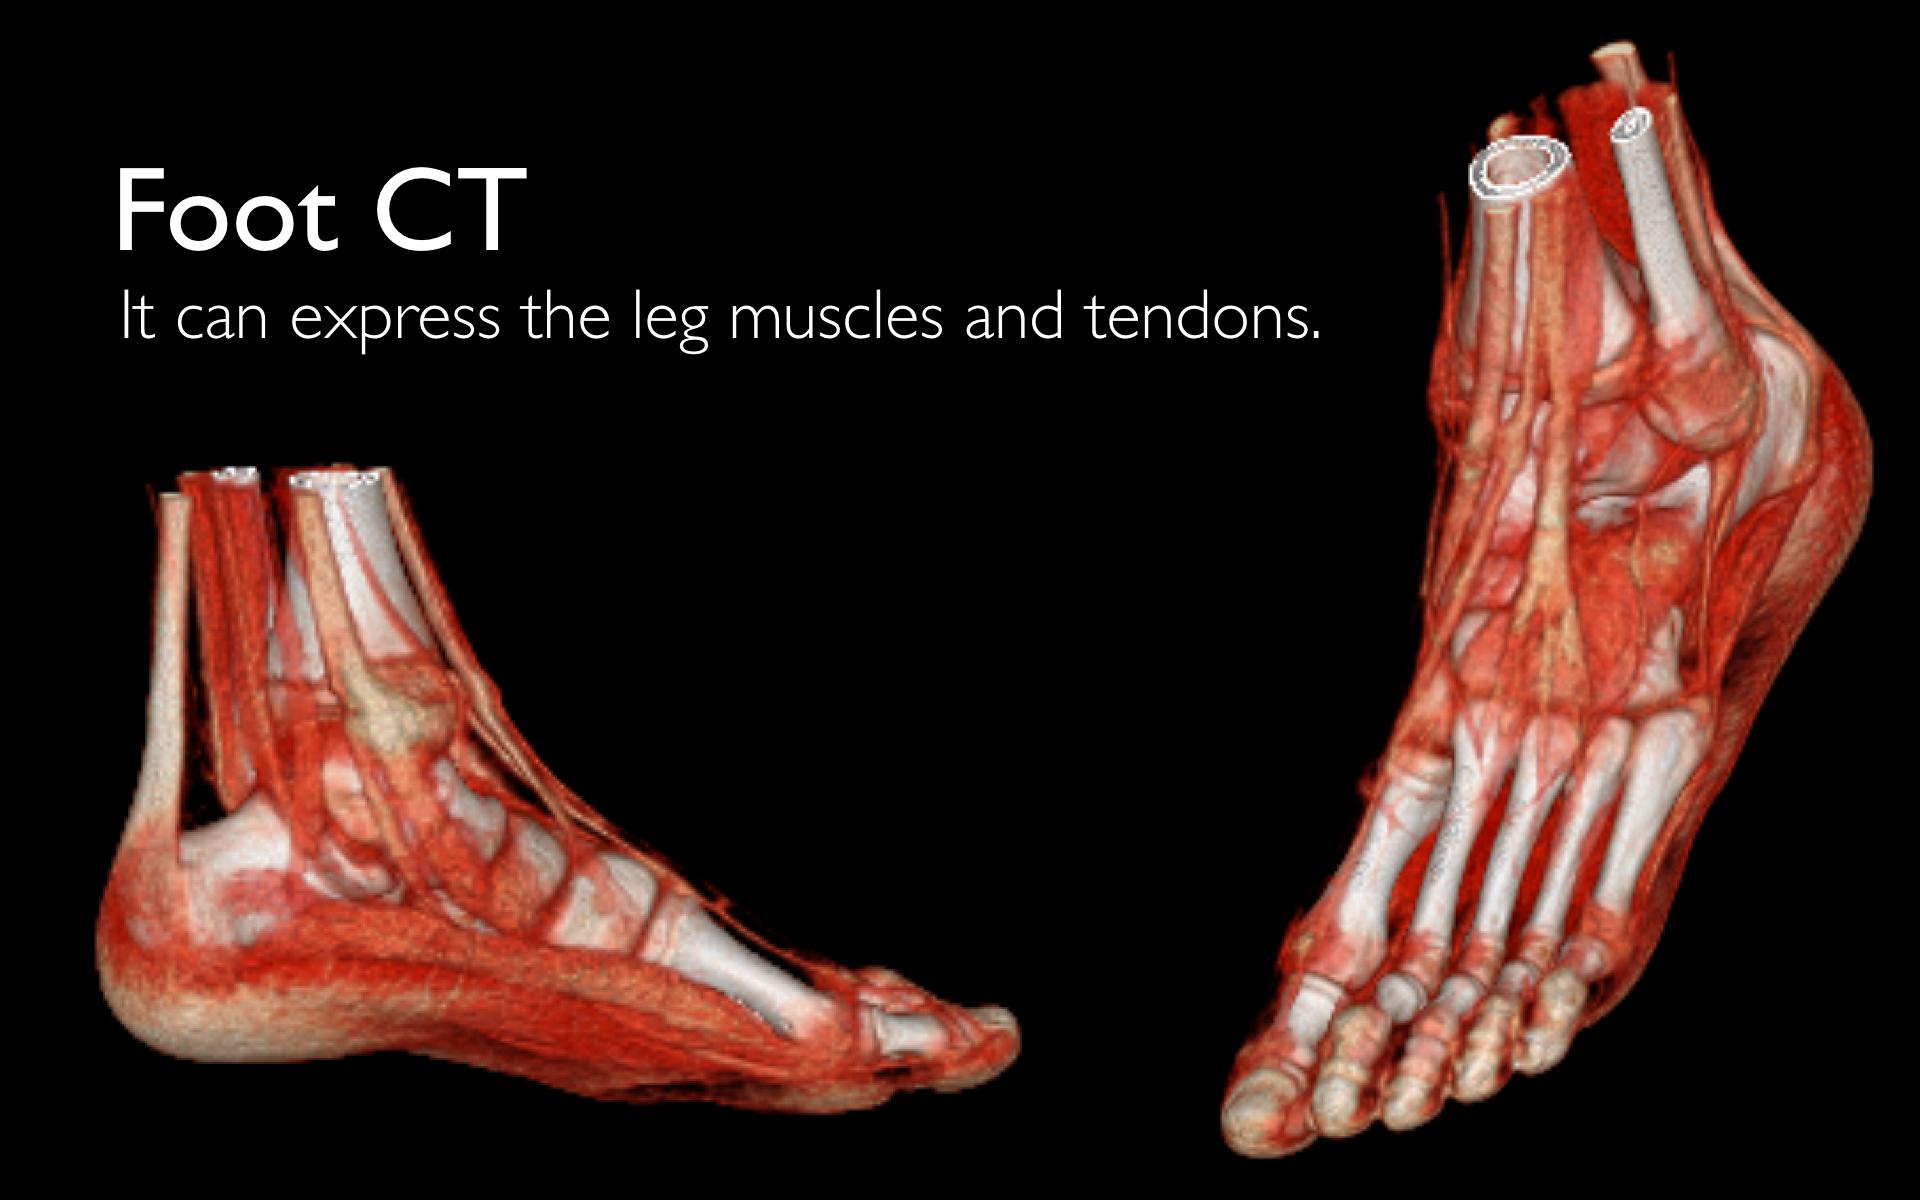 Foot CT